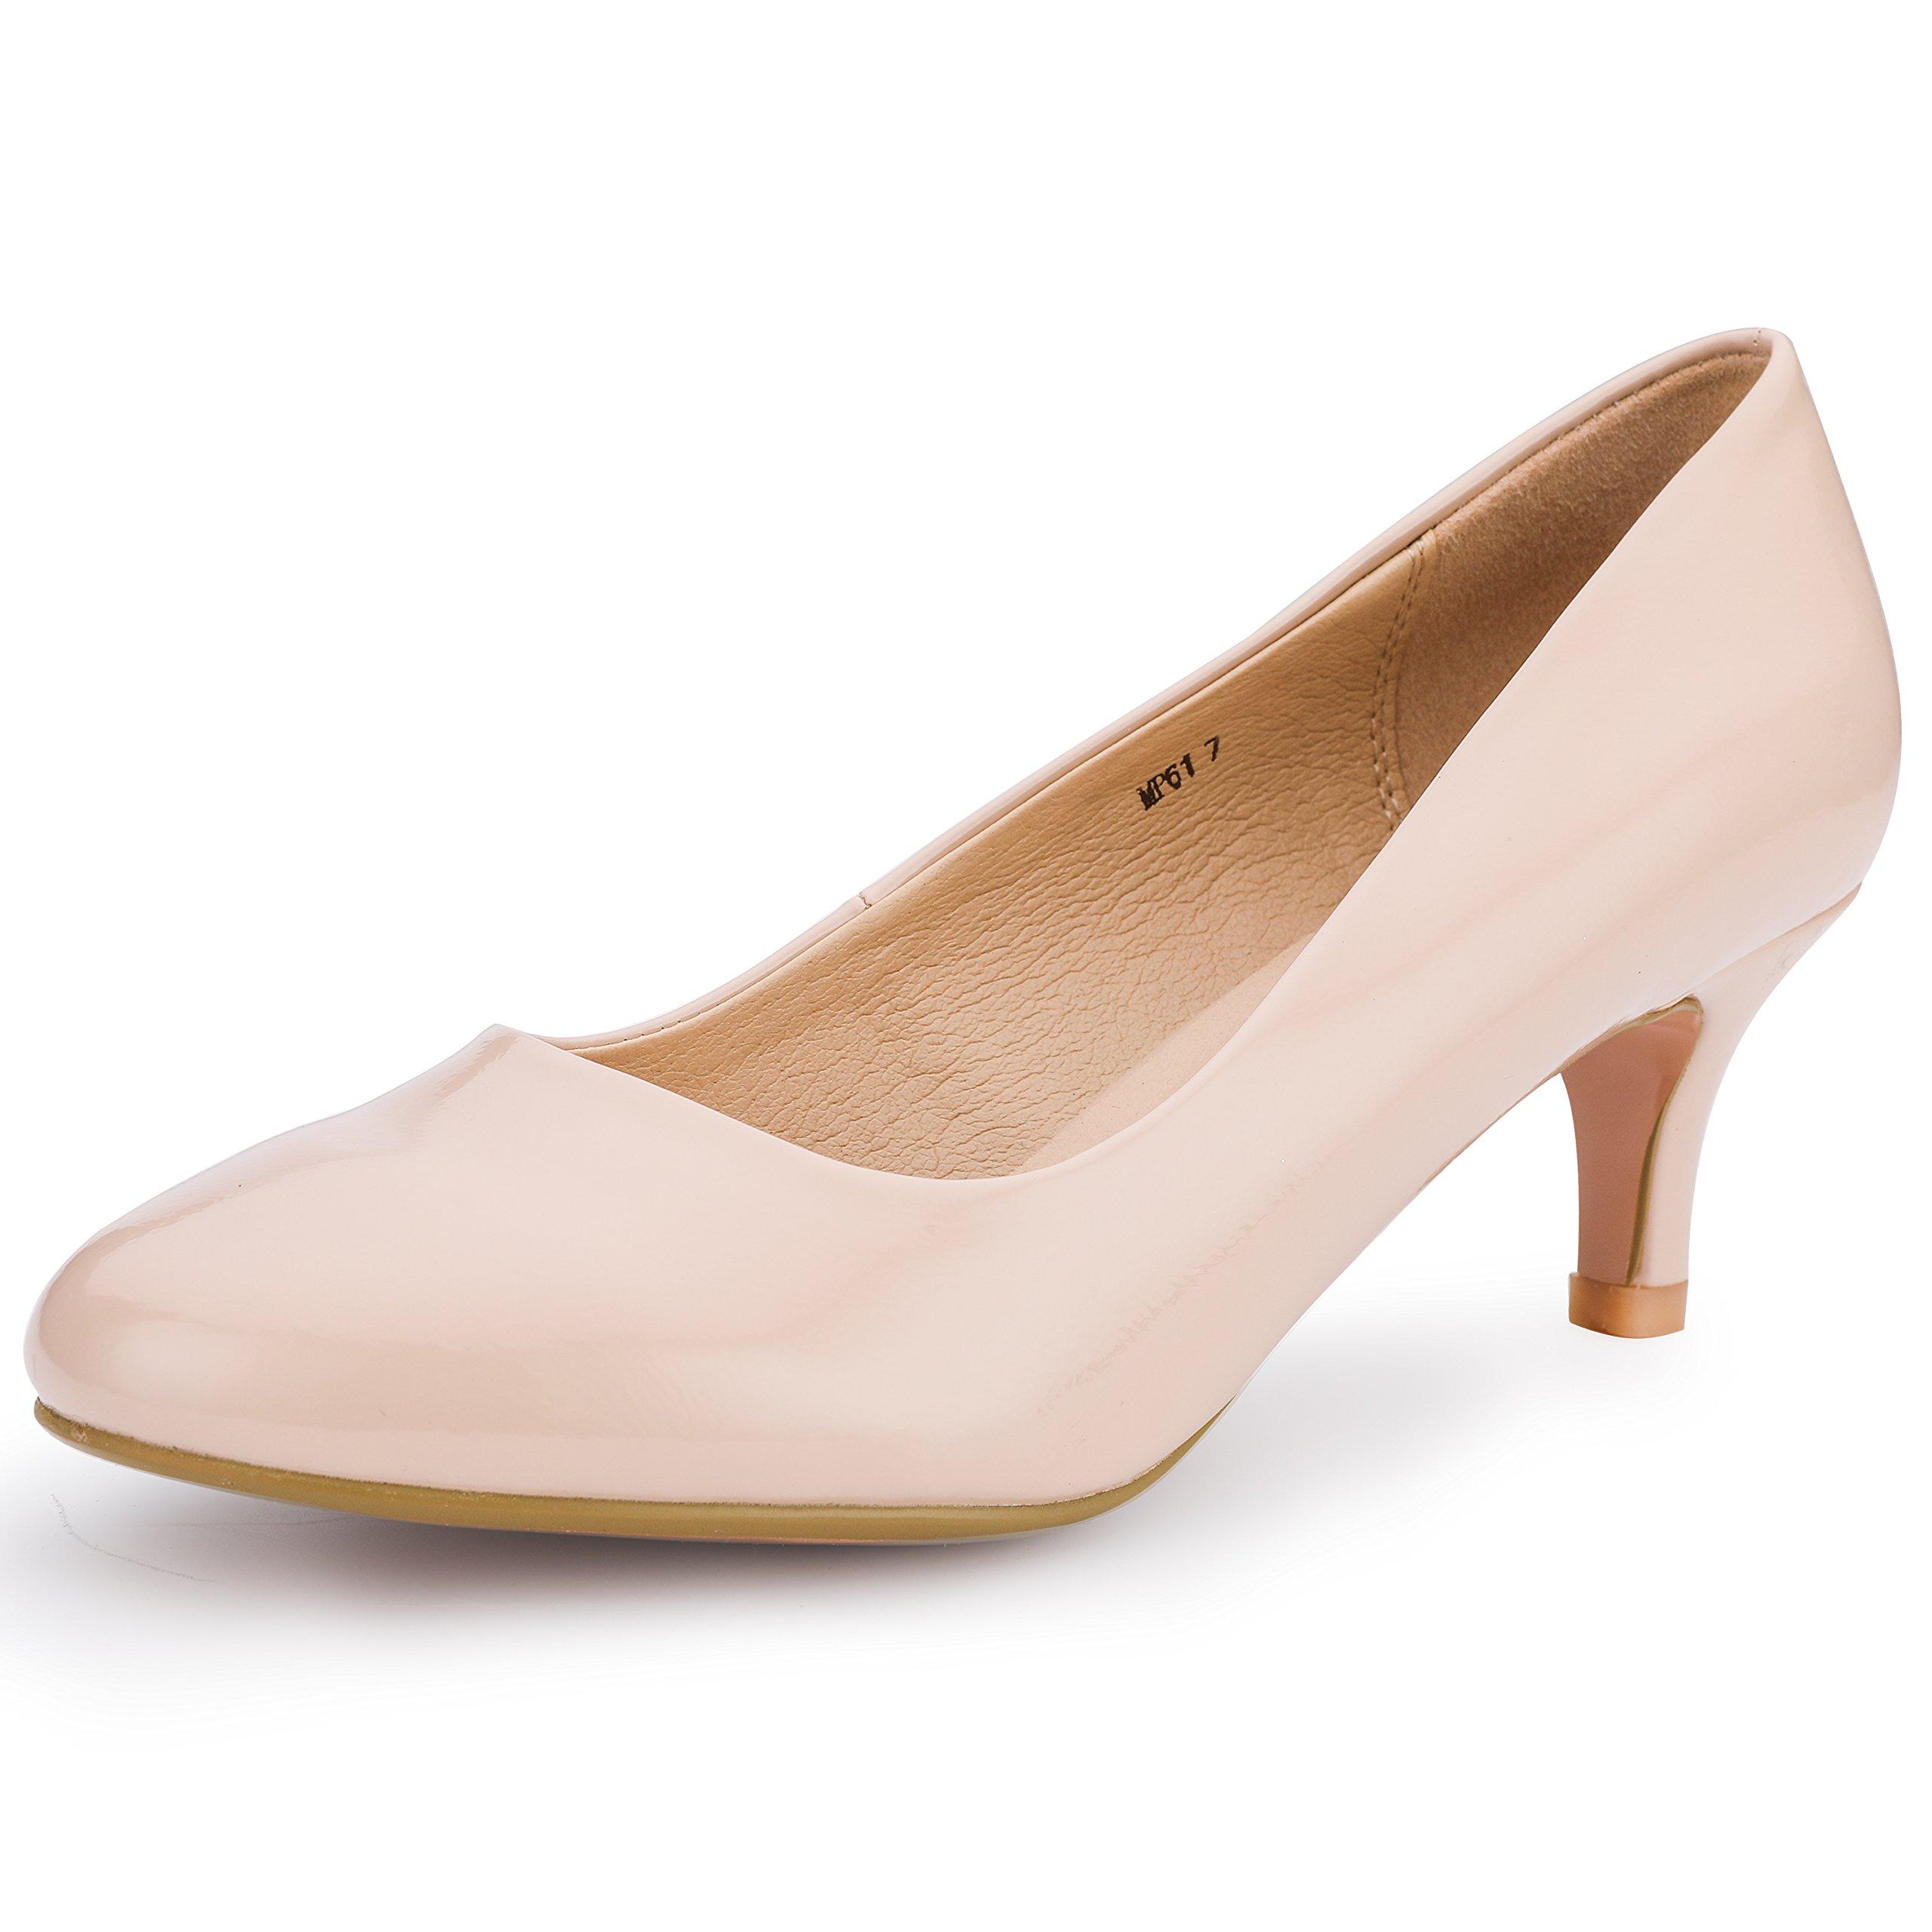 IDIFU Women's RO2 Basic Round Toe Mid Heel Pump Shoes (Nude Patent, 7.5 B(M) US)